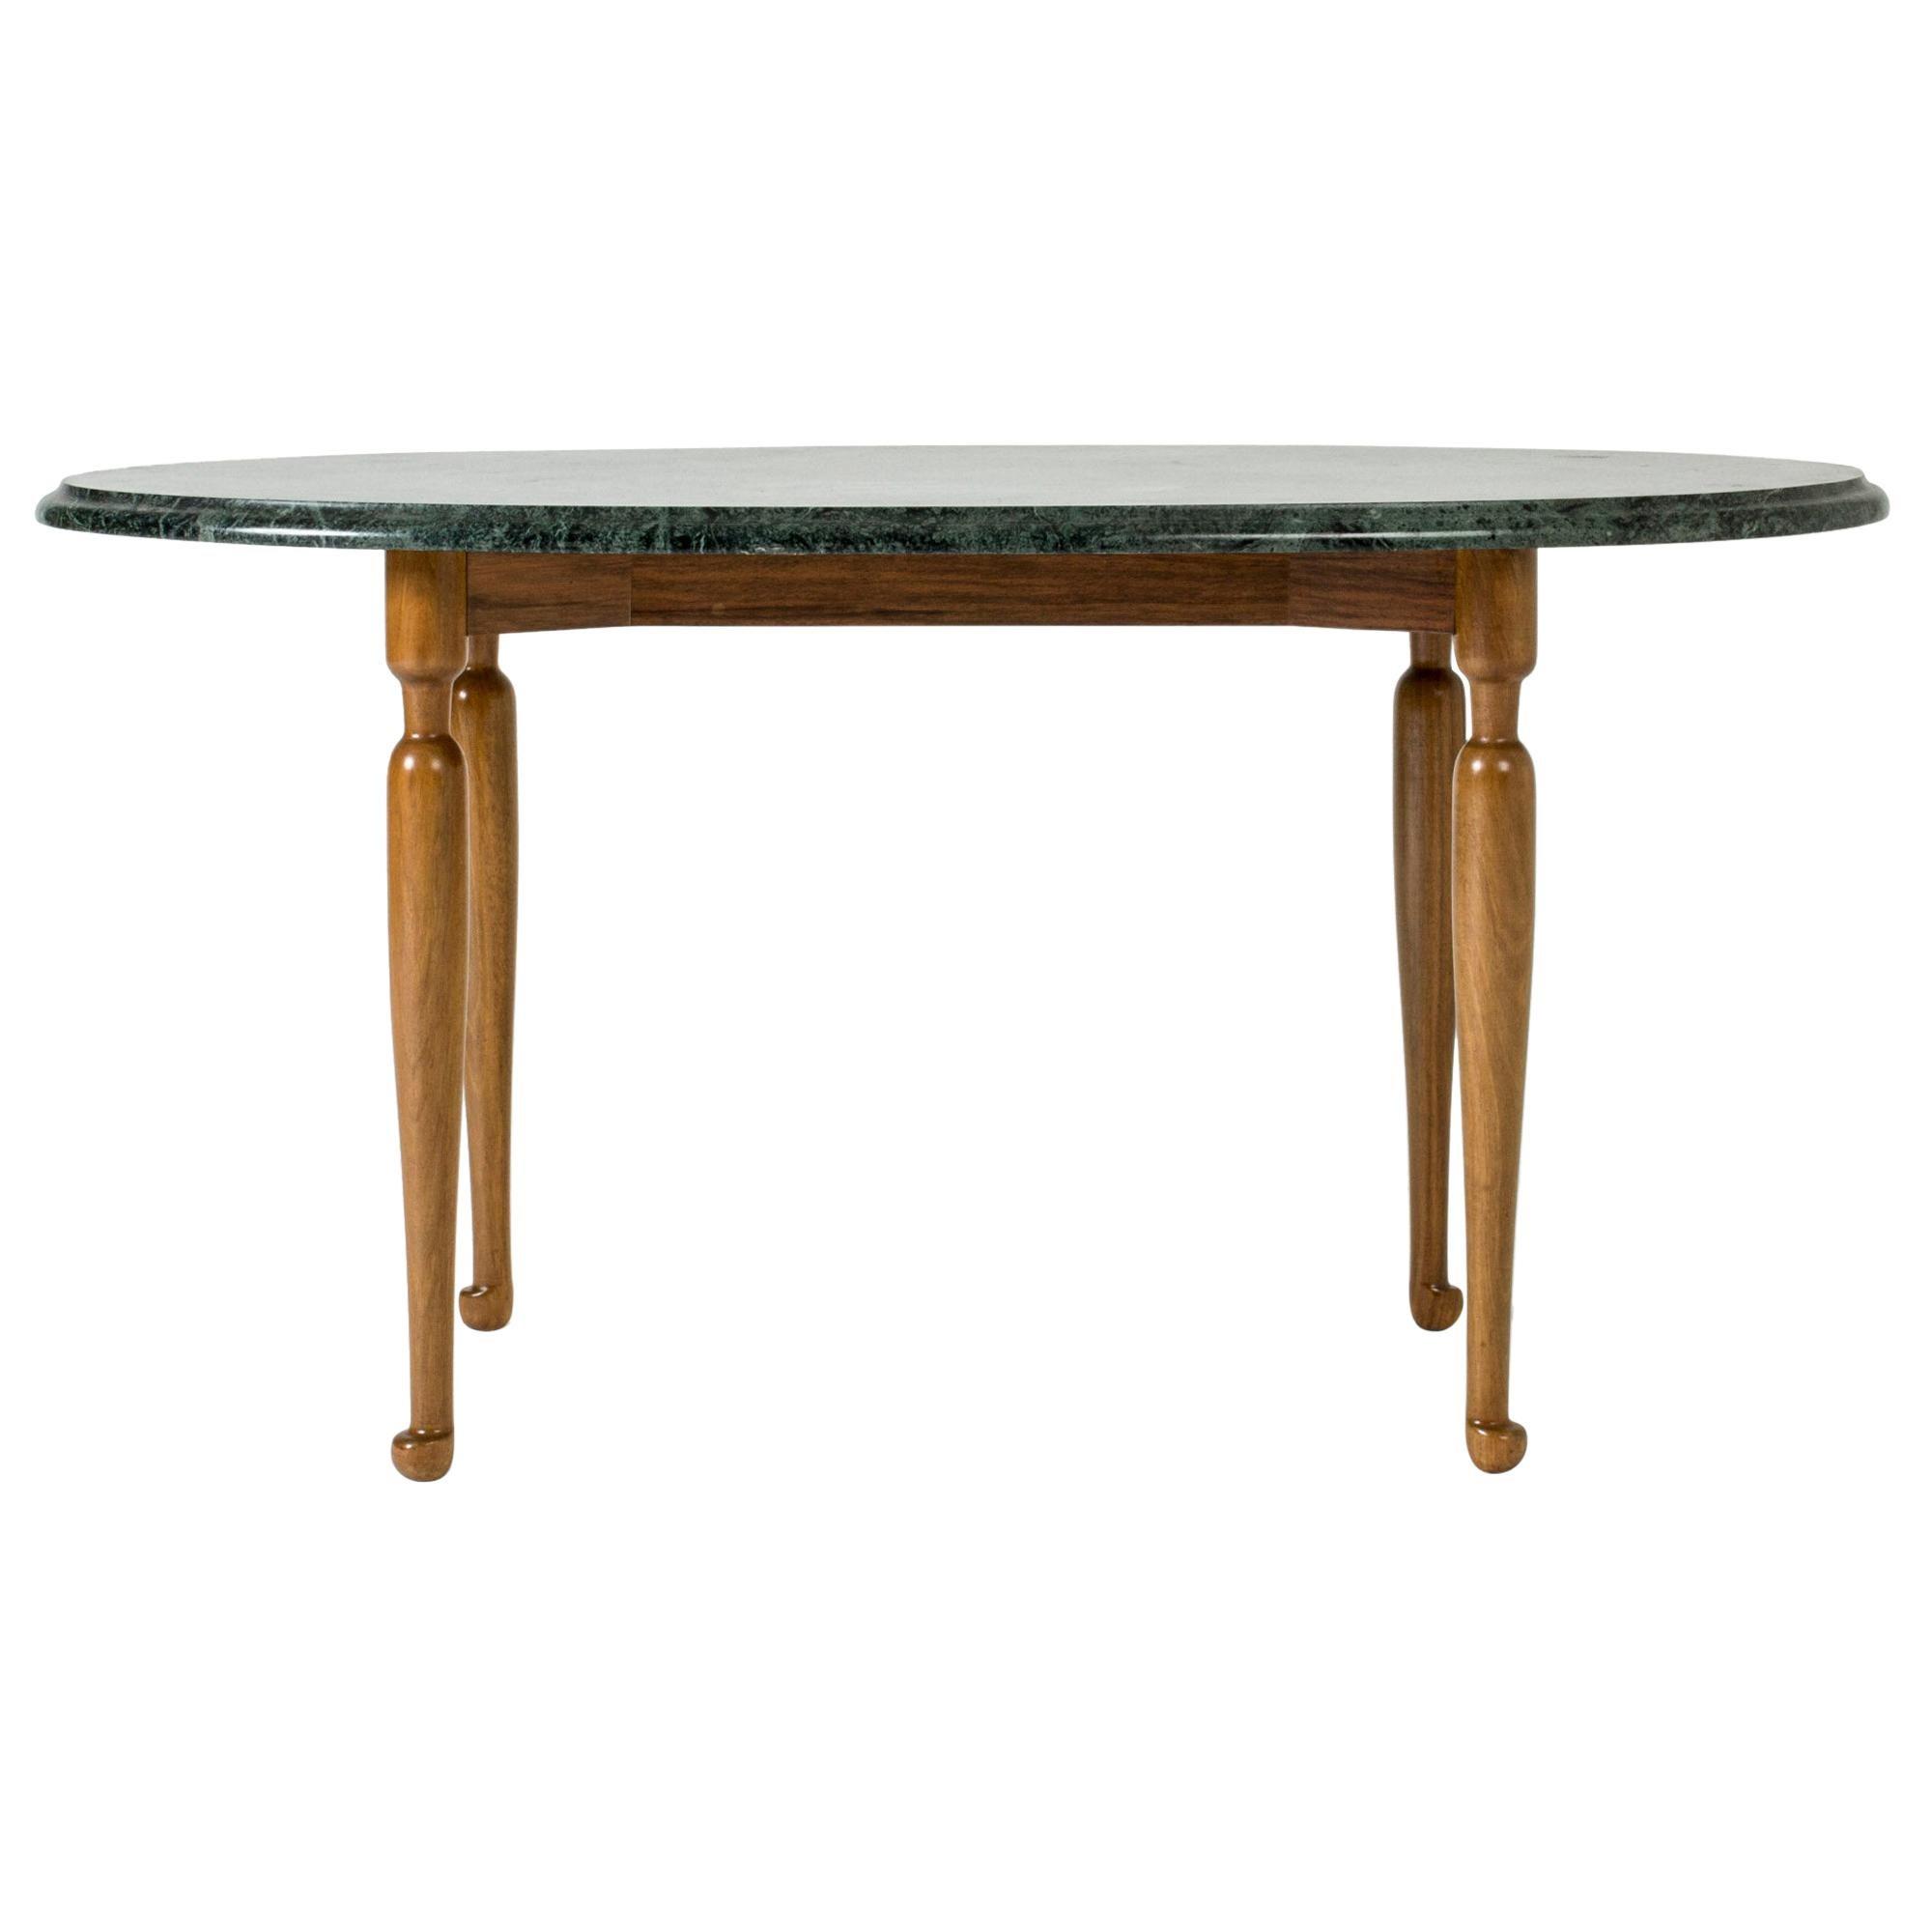 Marble and Mahogany Side Table by Josef Frank for Svenskt Tenn, Sweden, 1950s